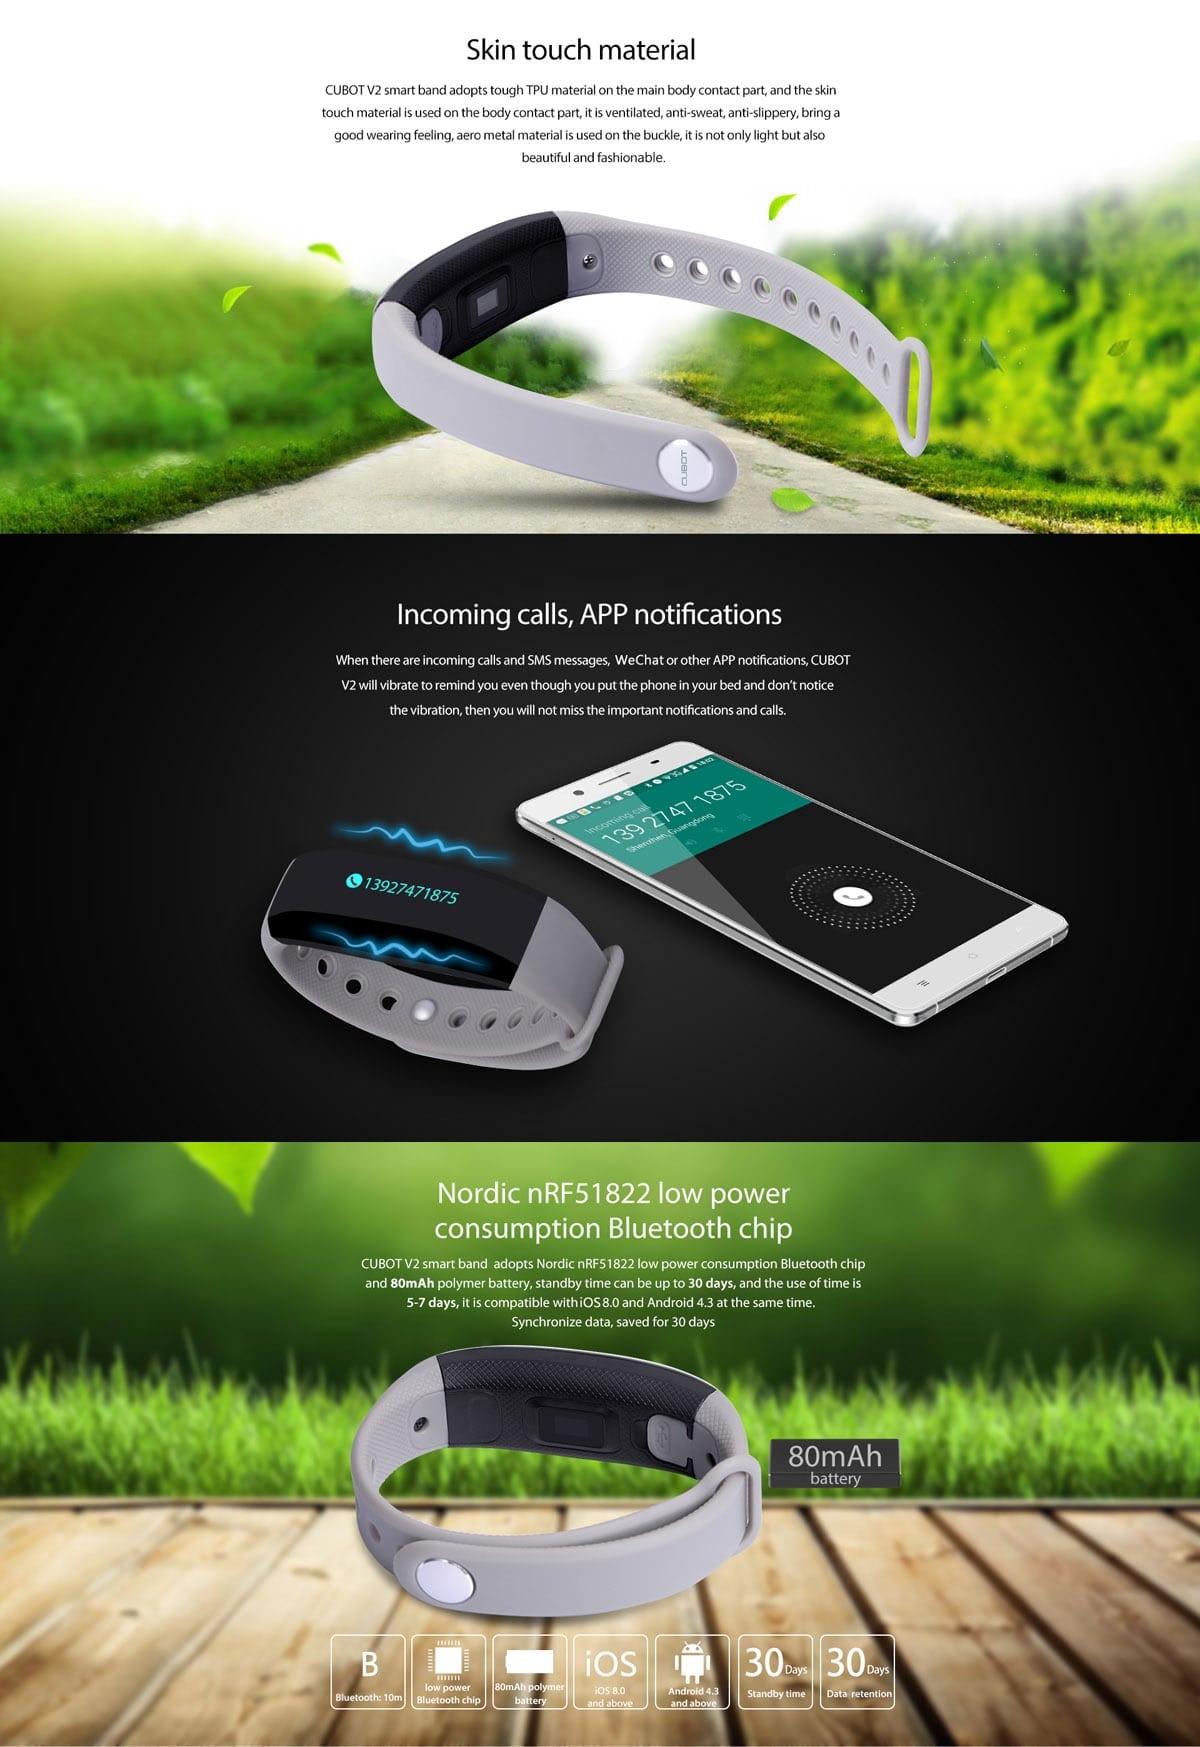 cubot v2 smart wrist band